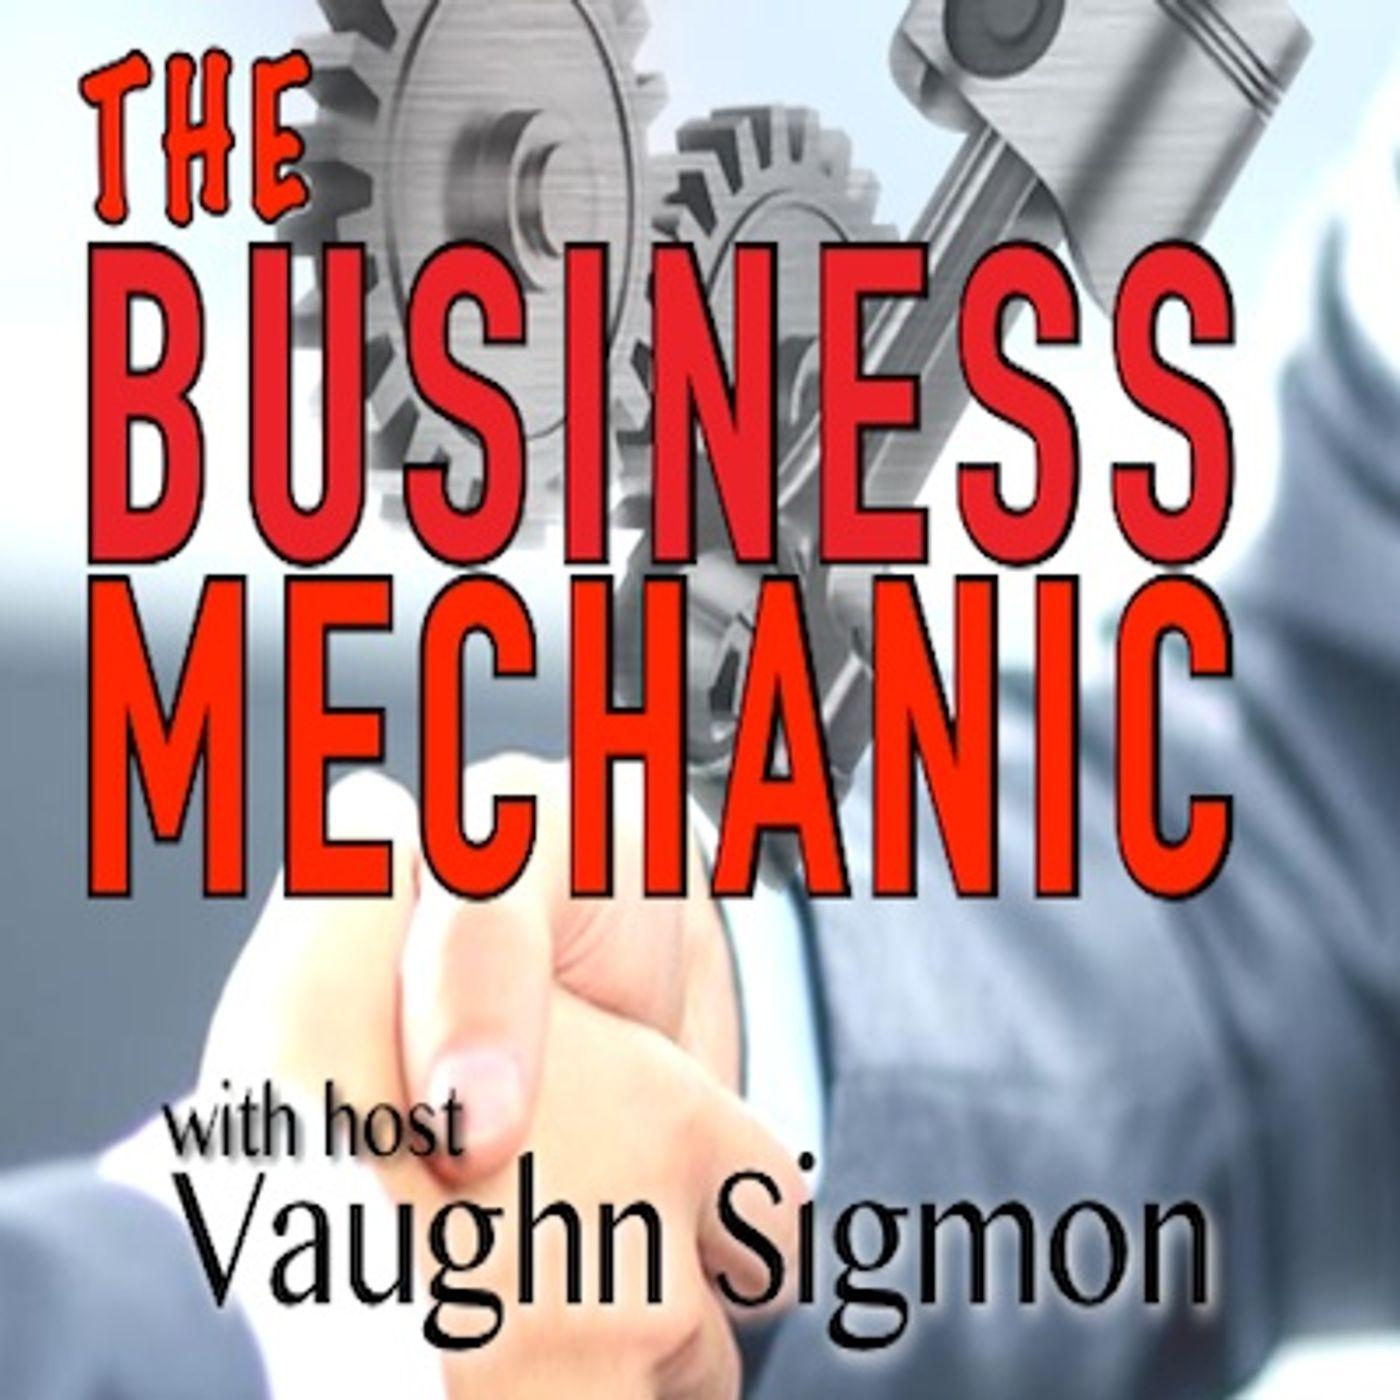 The Business Mechanic Show 75